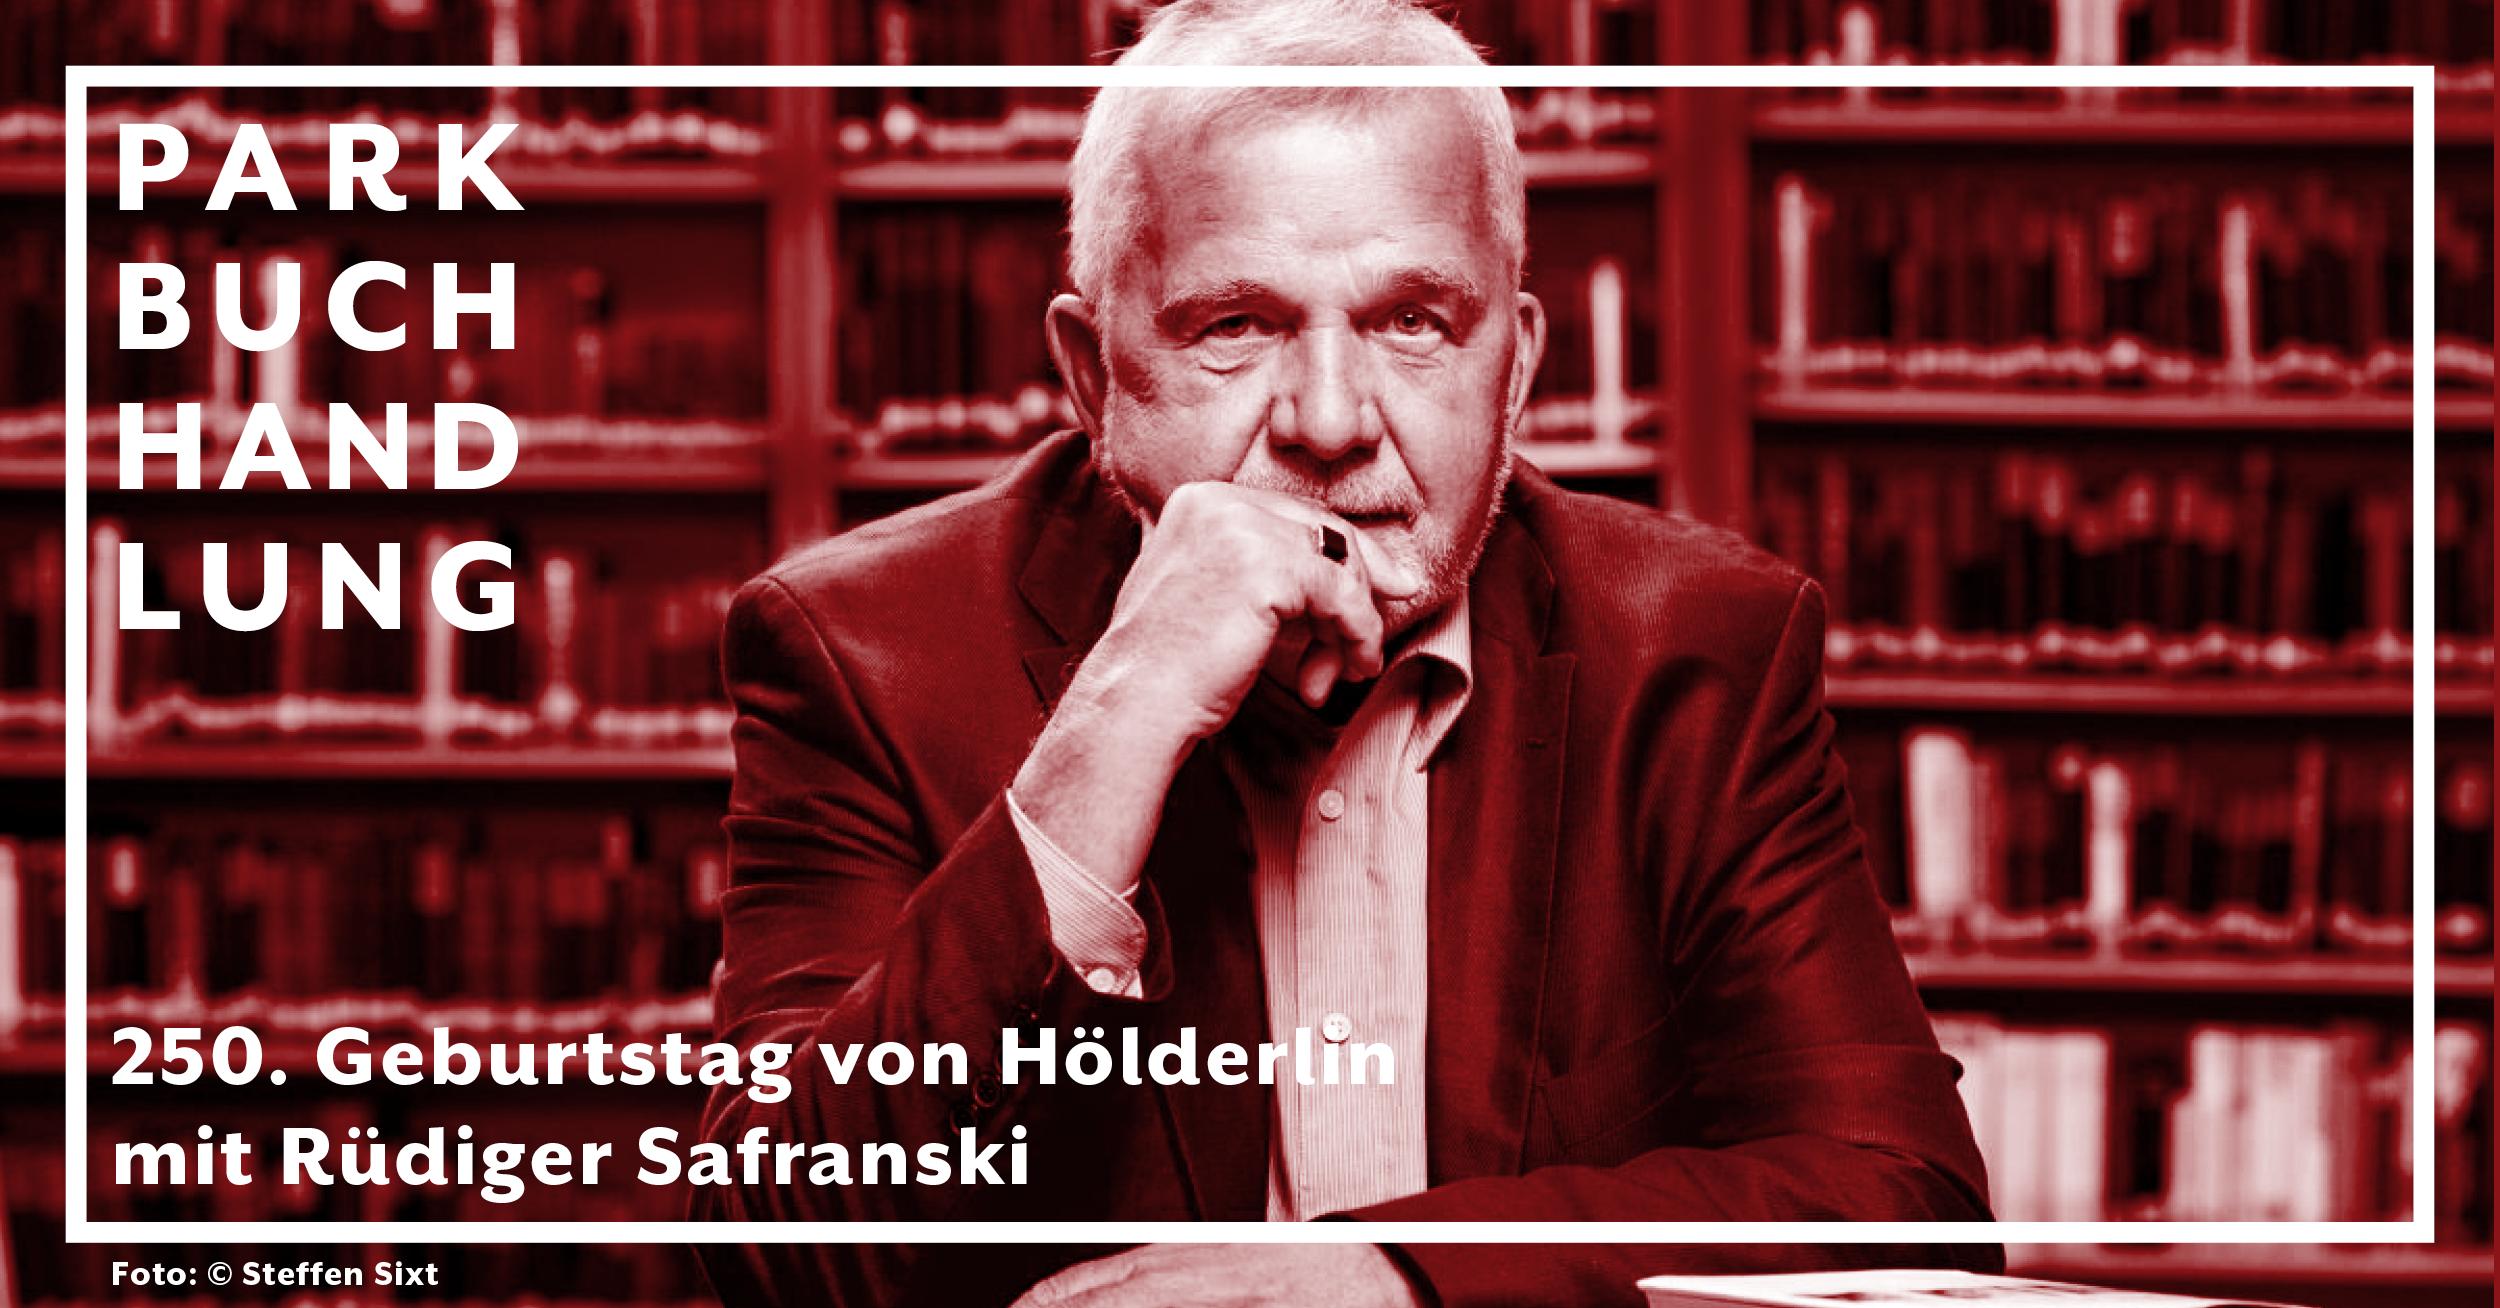 Rüdiger Safranski zum 250. Geburtstag Friedrich Hölderlins Parkbuchhandlung Buchhandlung Bonn Bad Godesberg